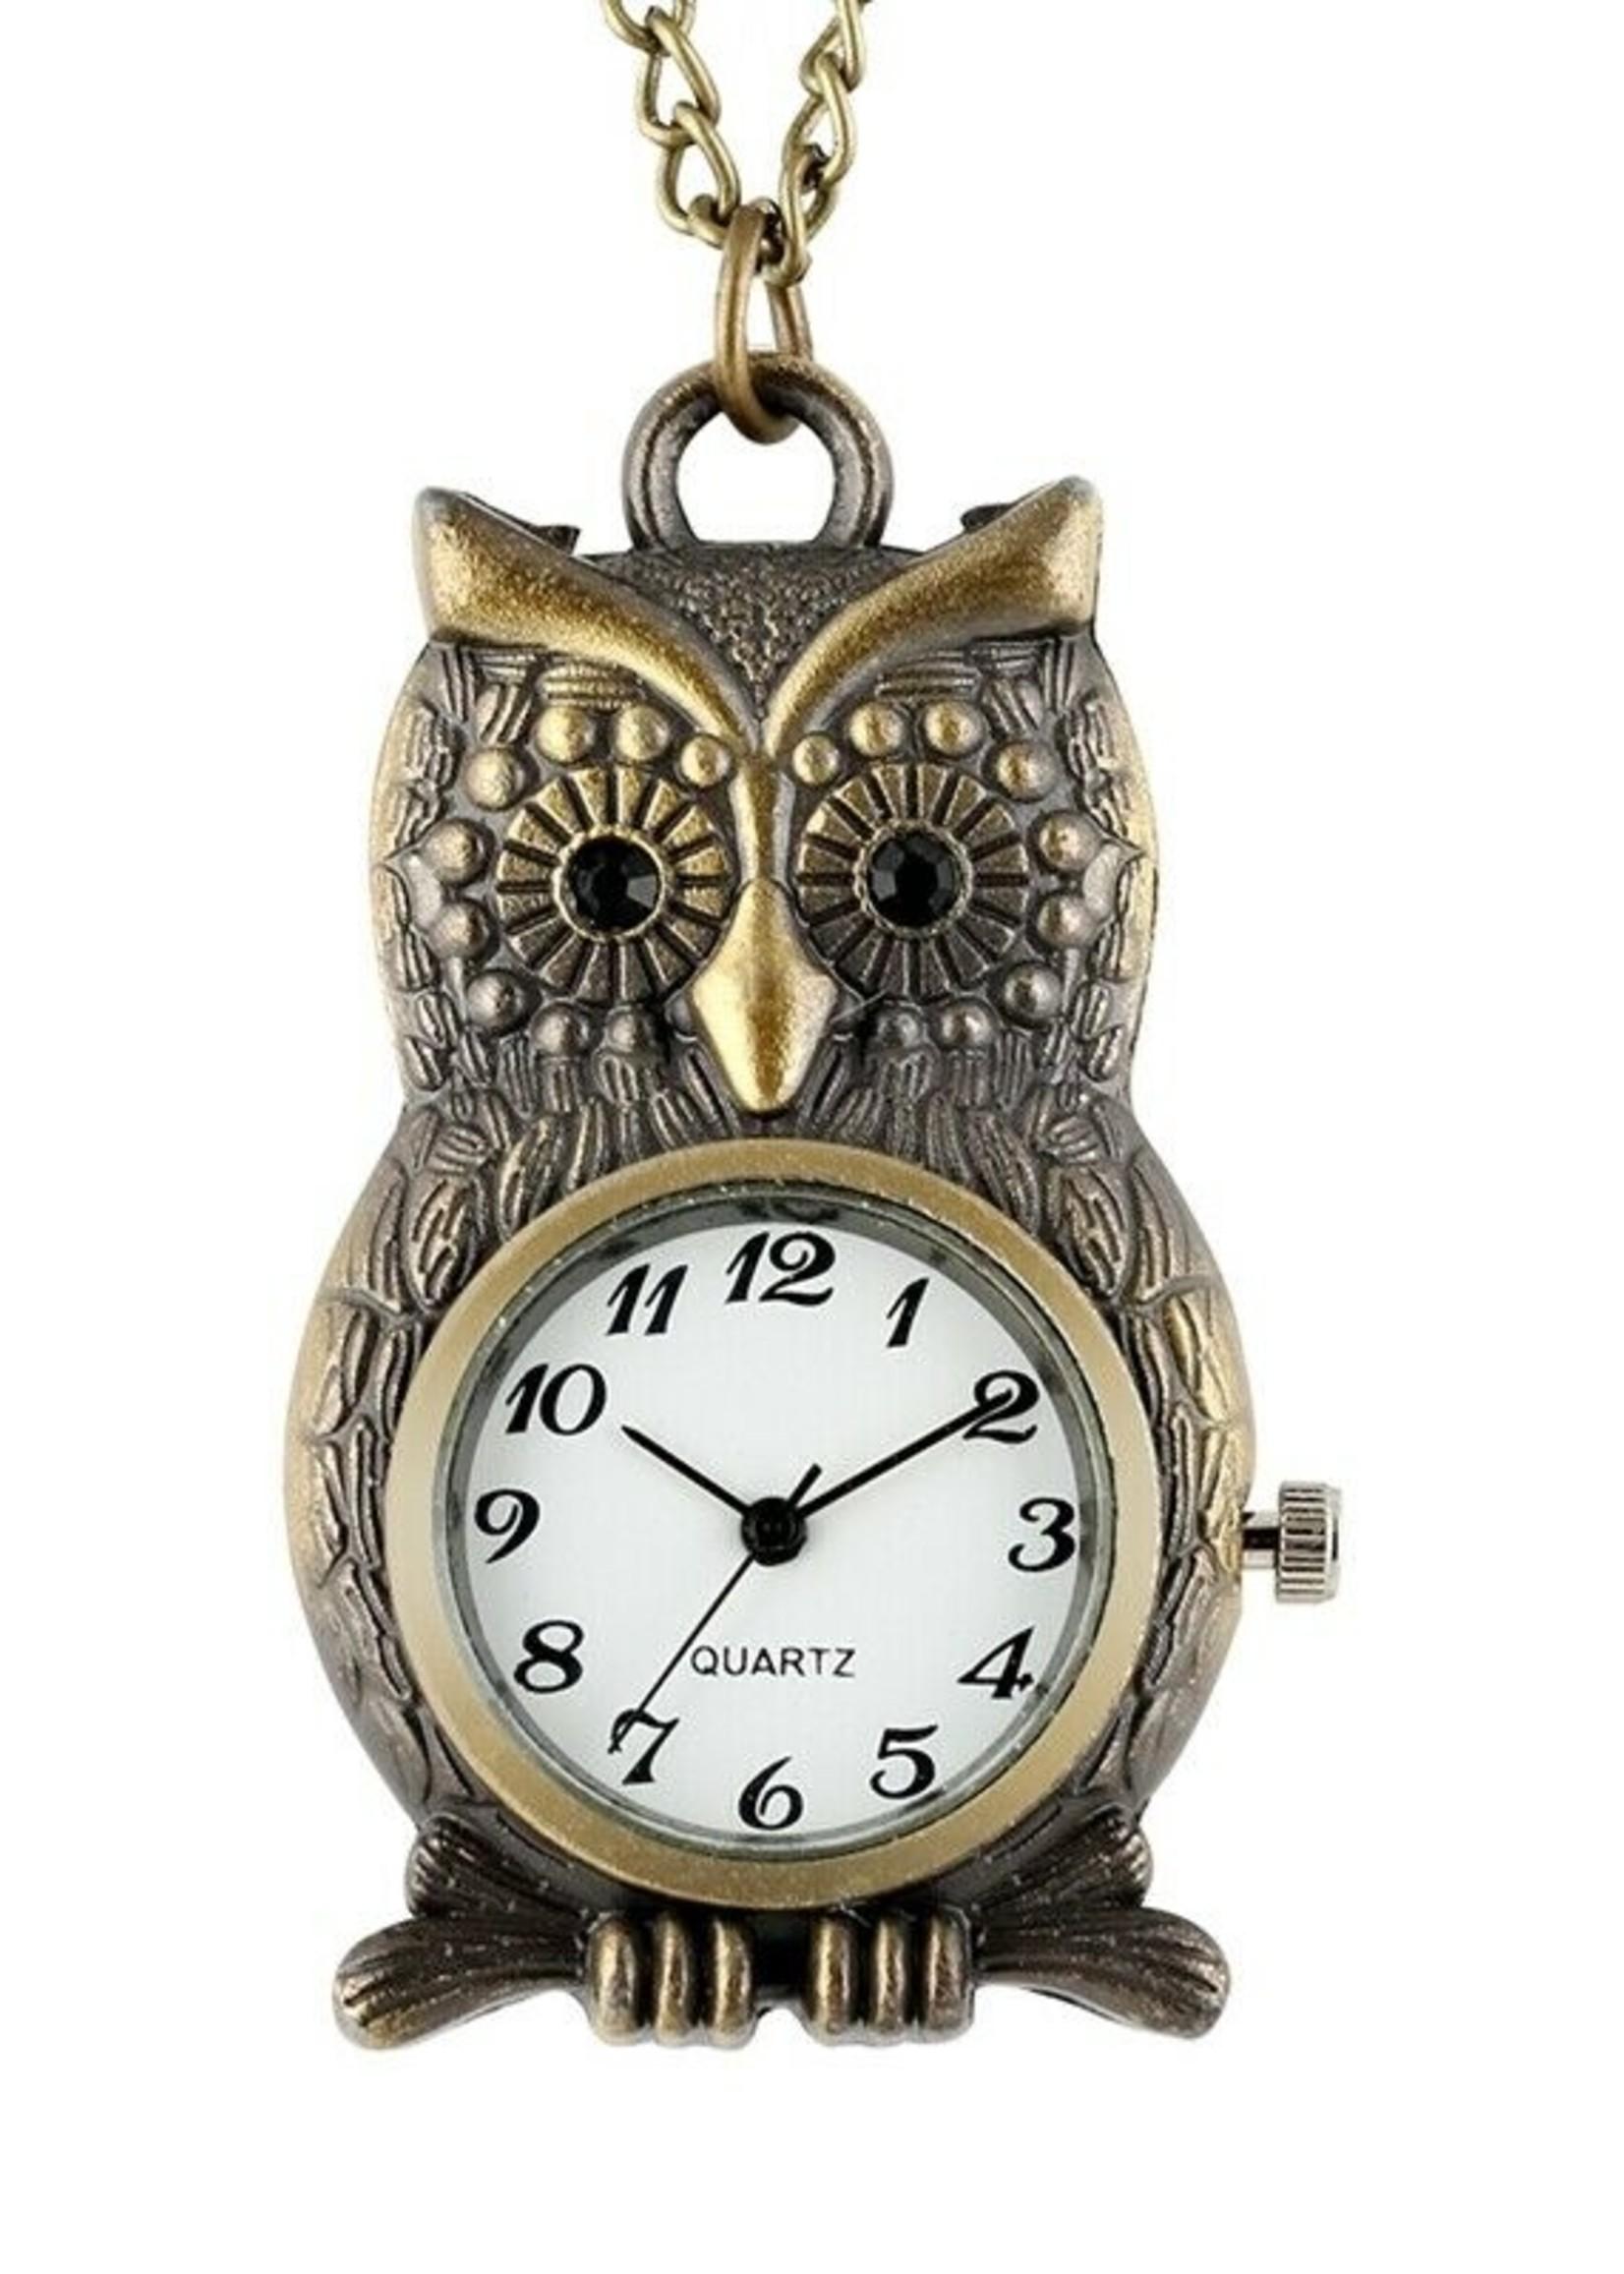 Perched Owl Antique Bronze Pocket Watch Necklace